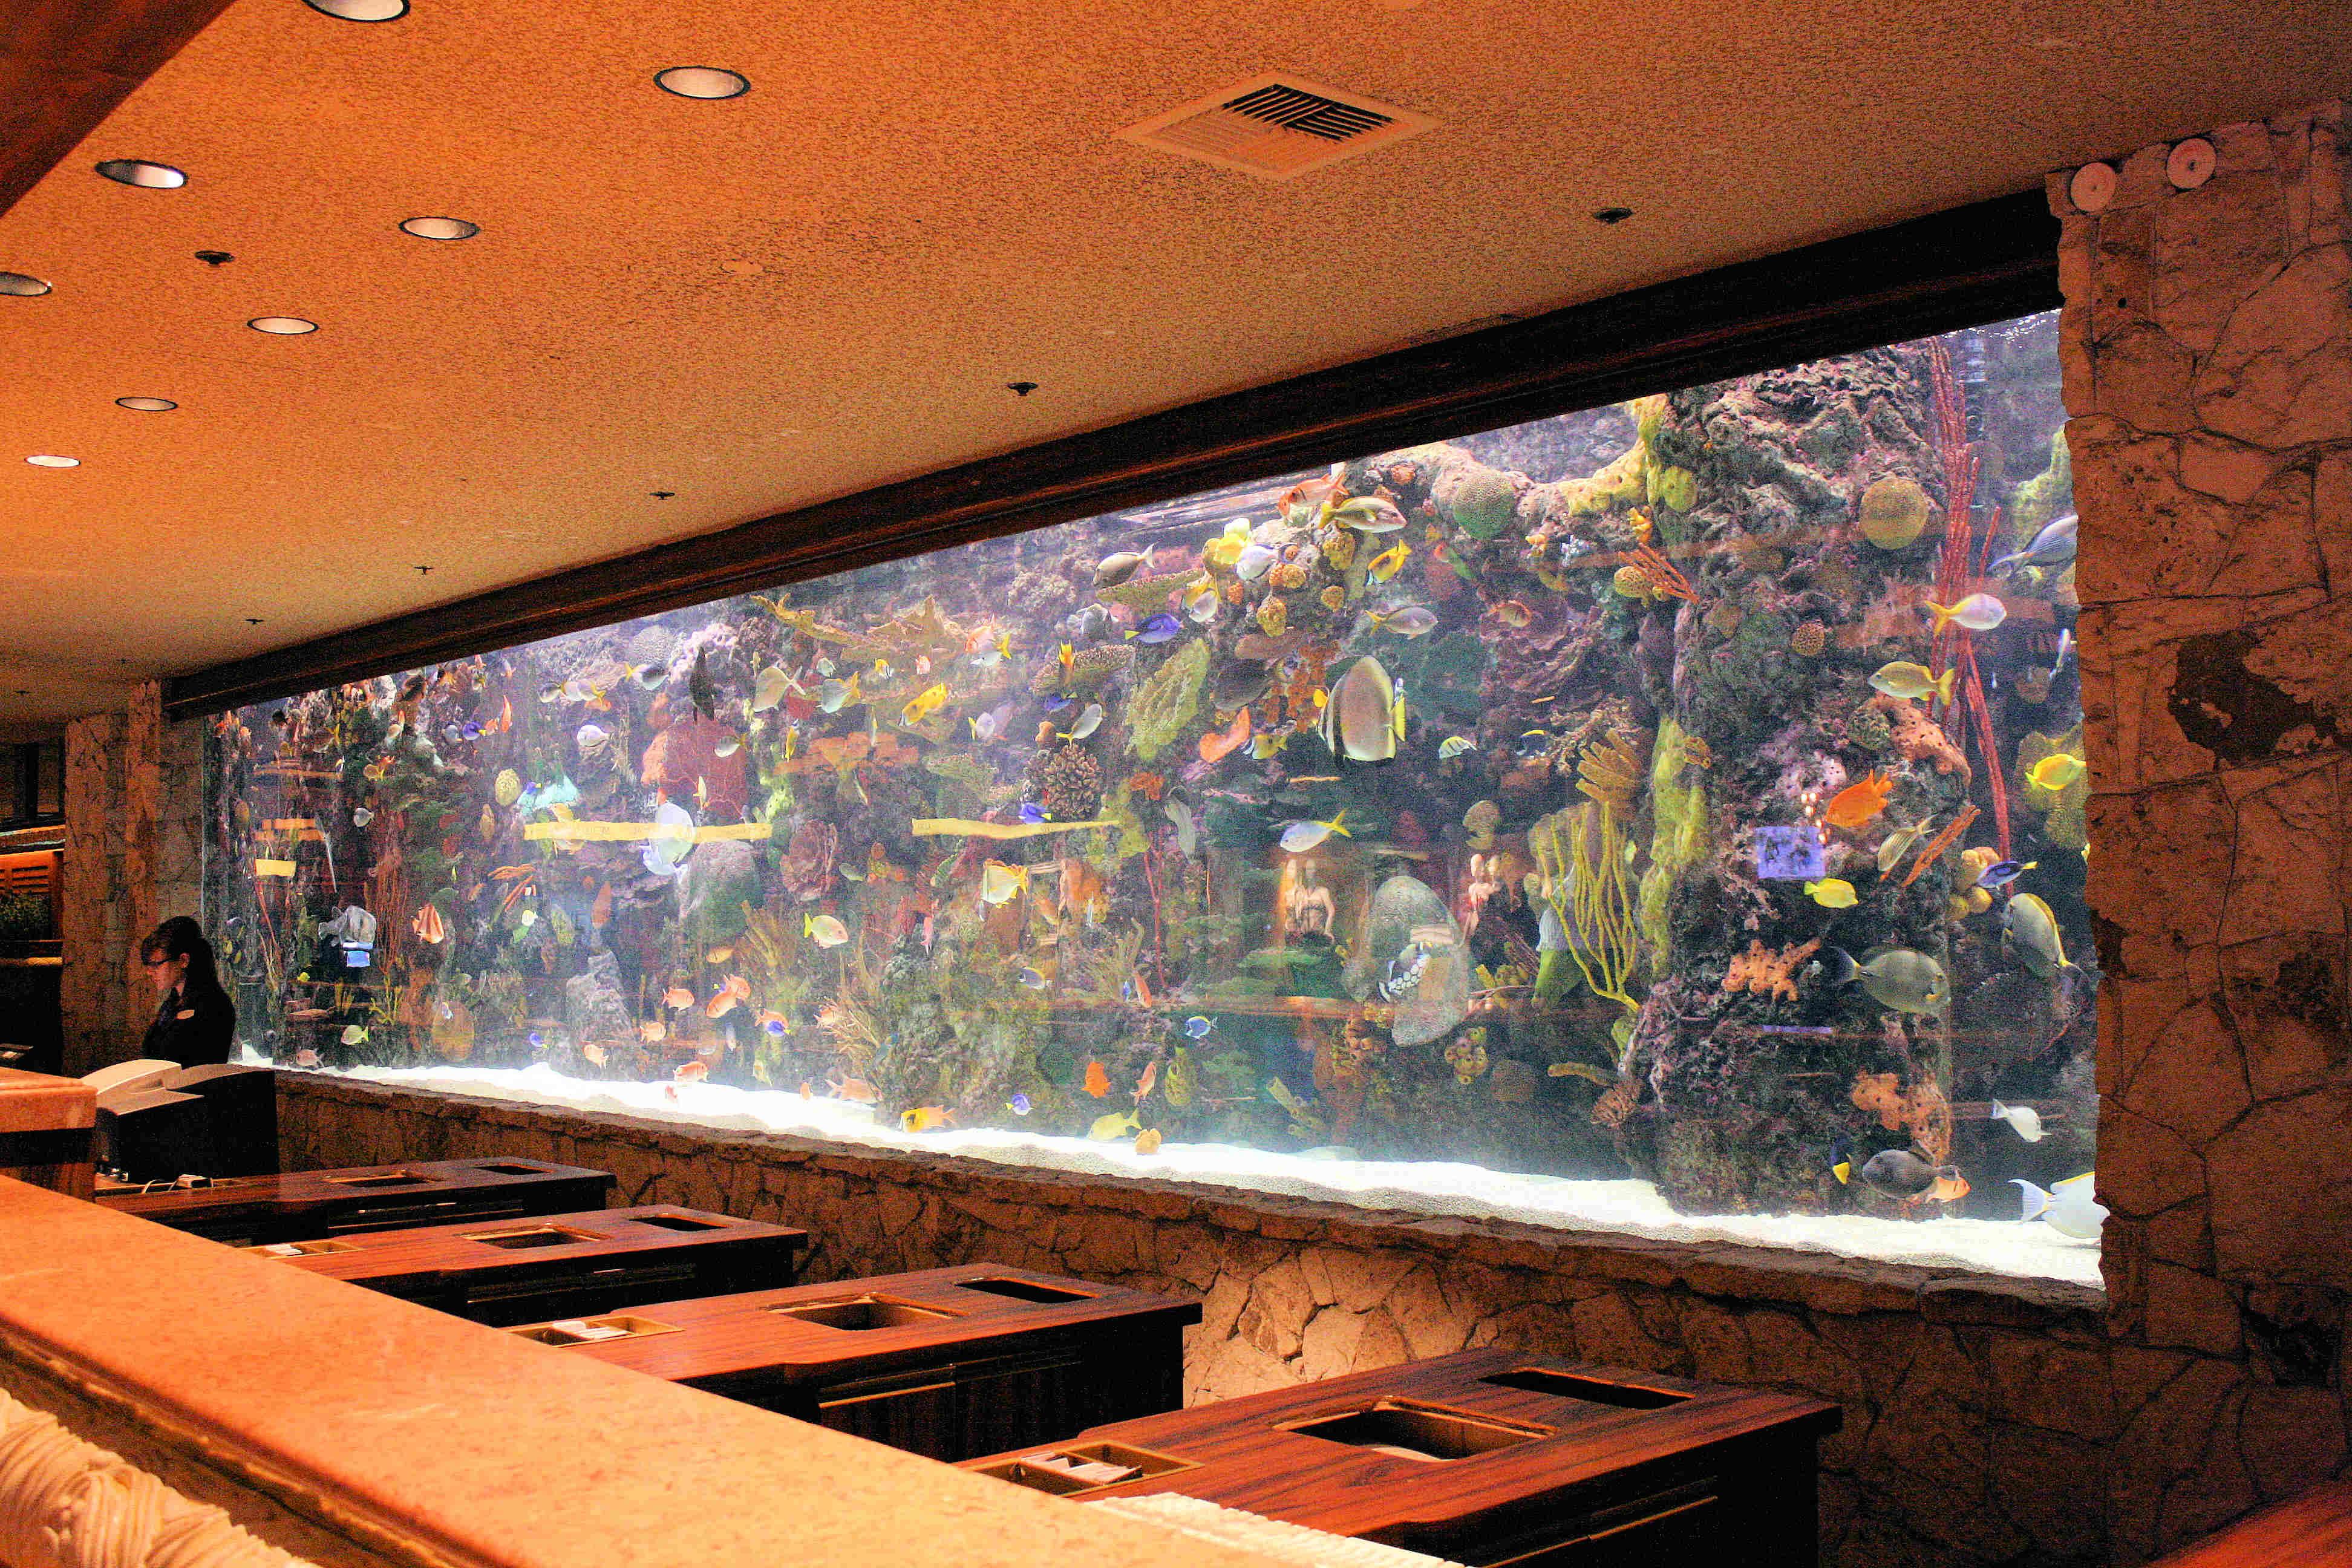 caesars palace aquarium vegas mavens